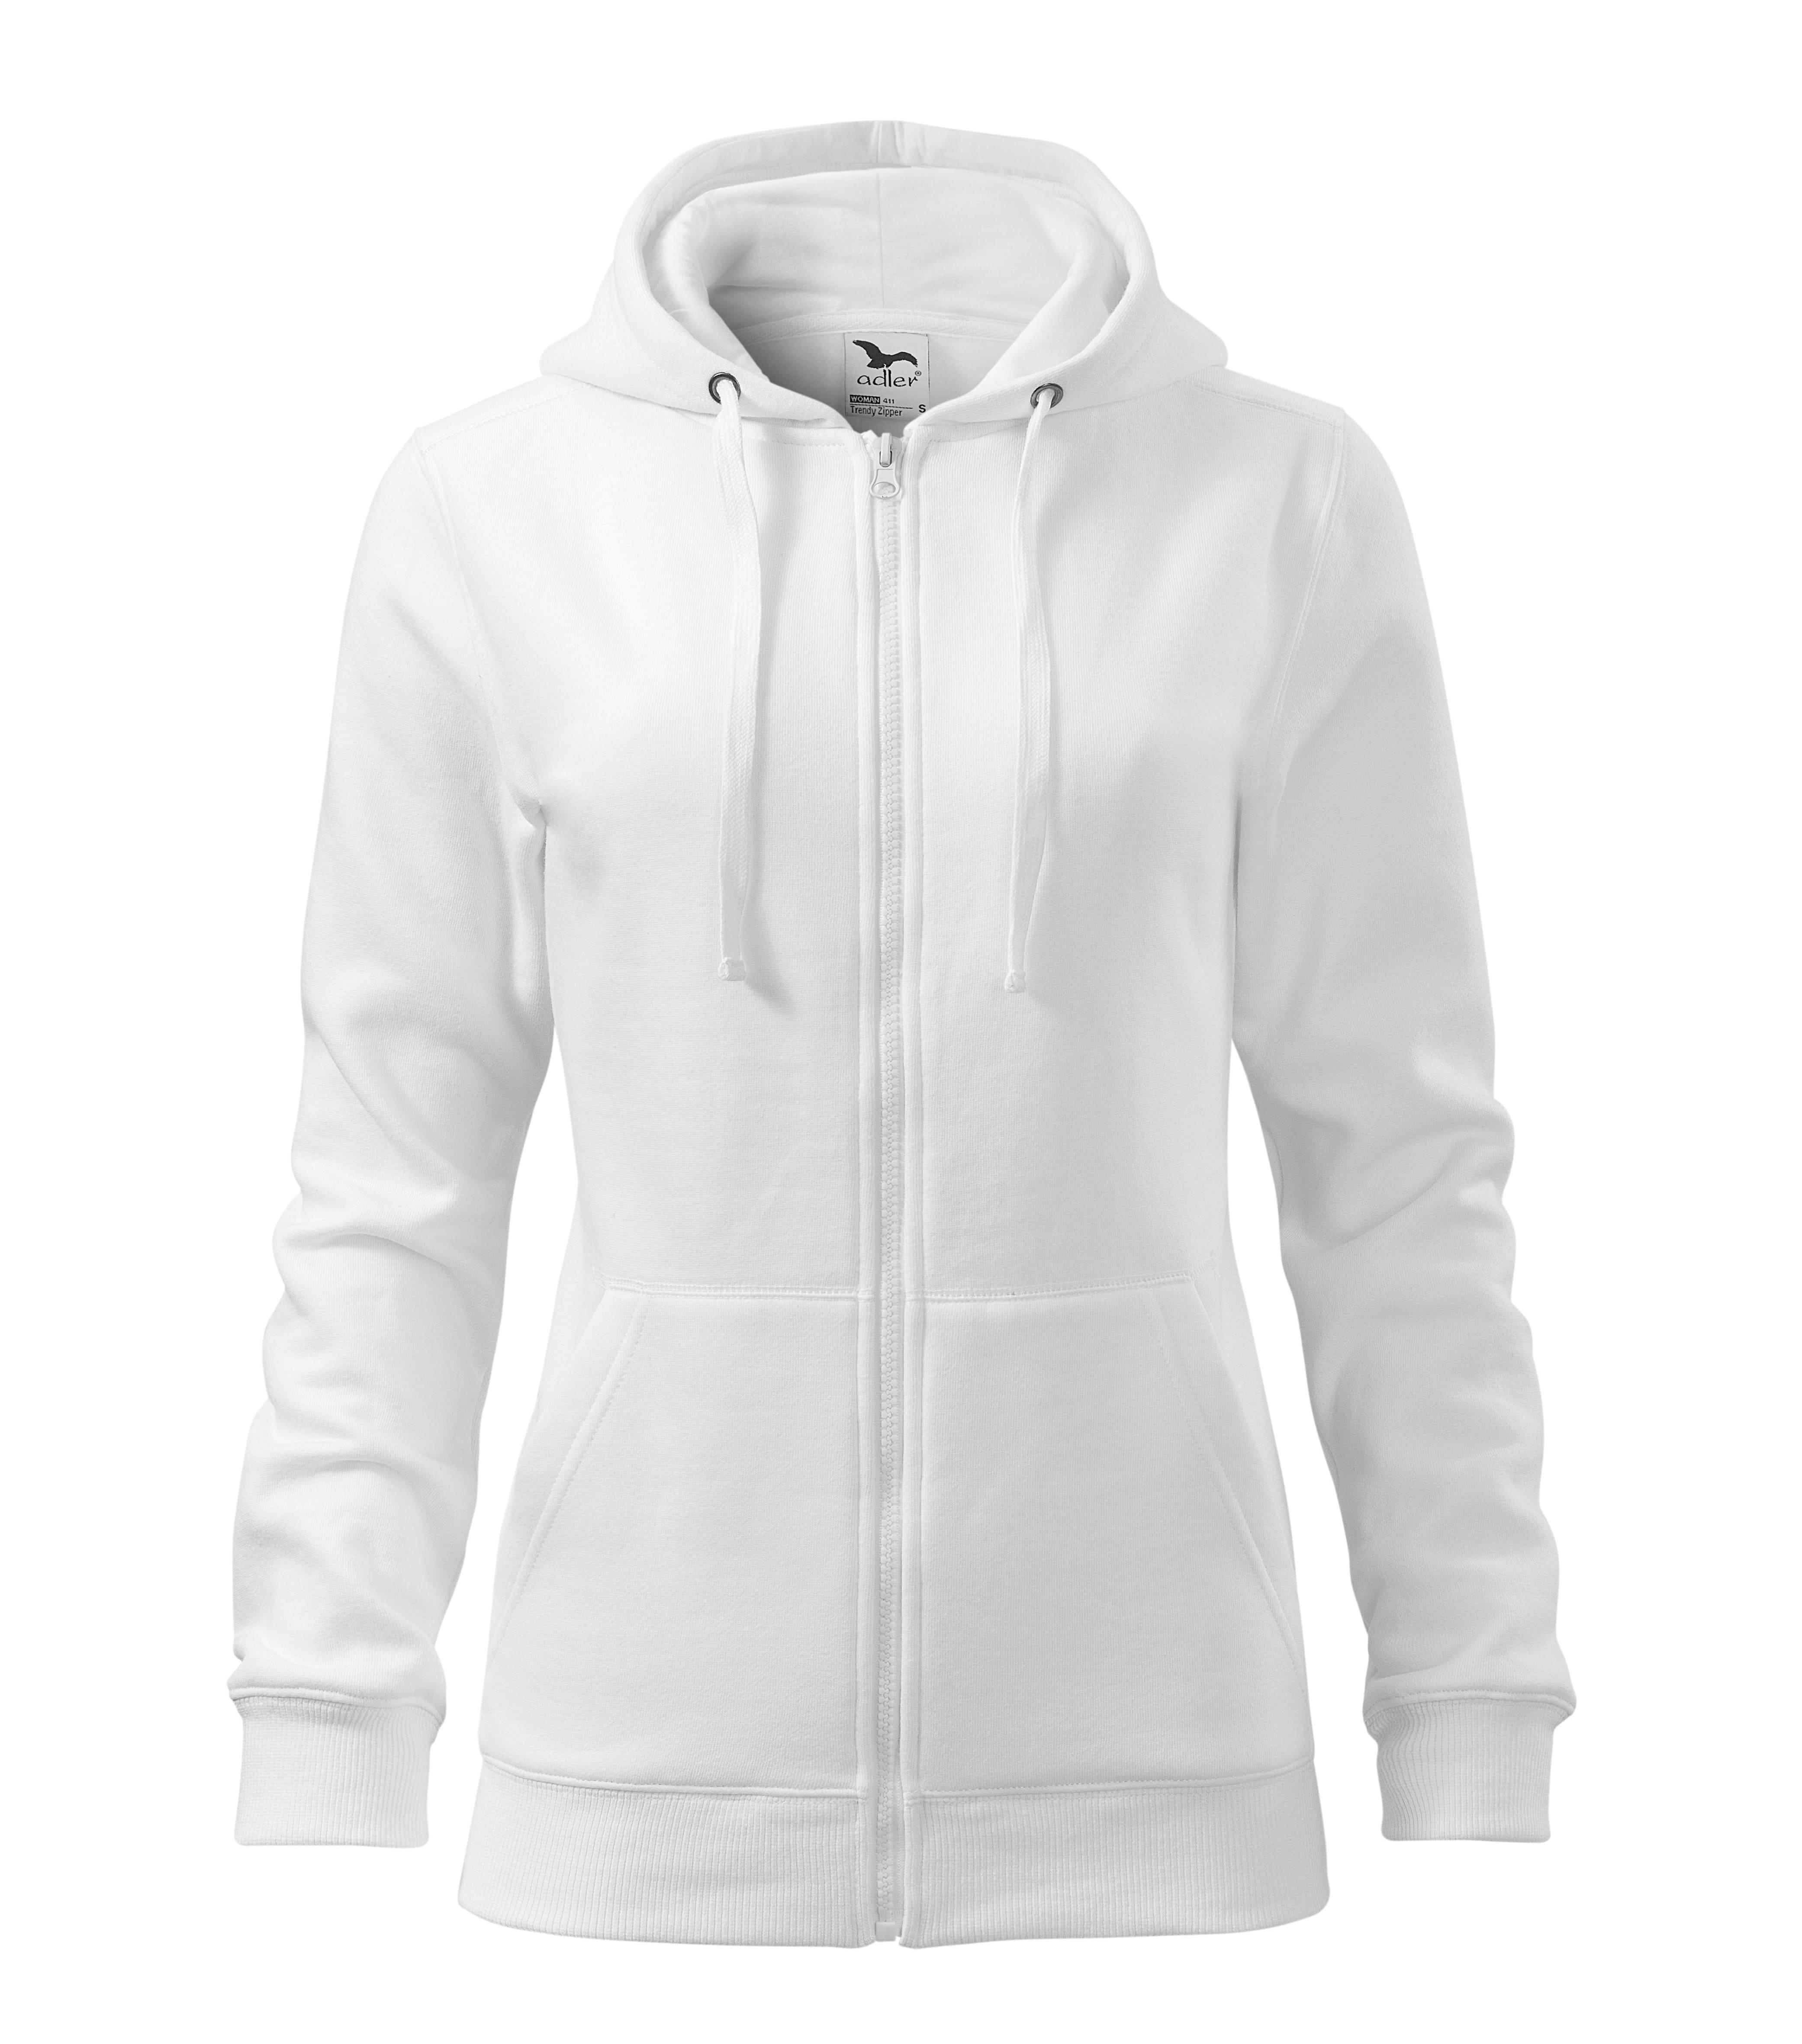 Custom Printed/ Embroidered Women Zipped Sweatshirt Hoodies, white, www.ontimeprint.co.uk